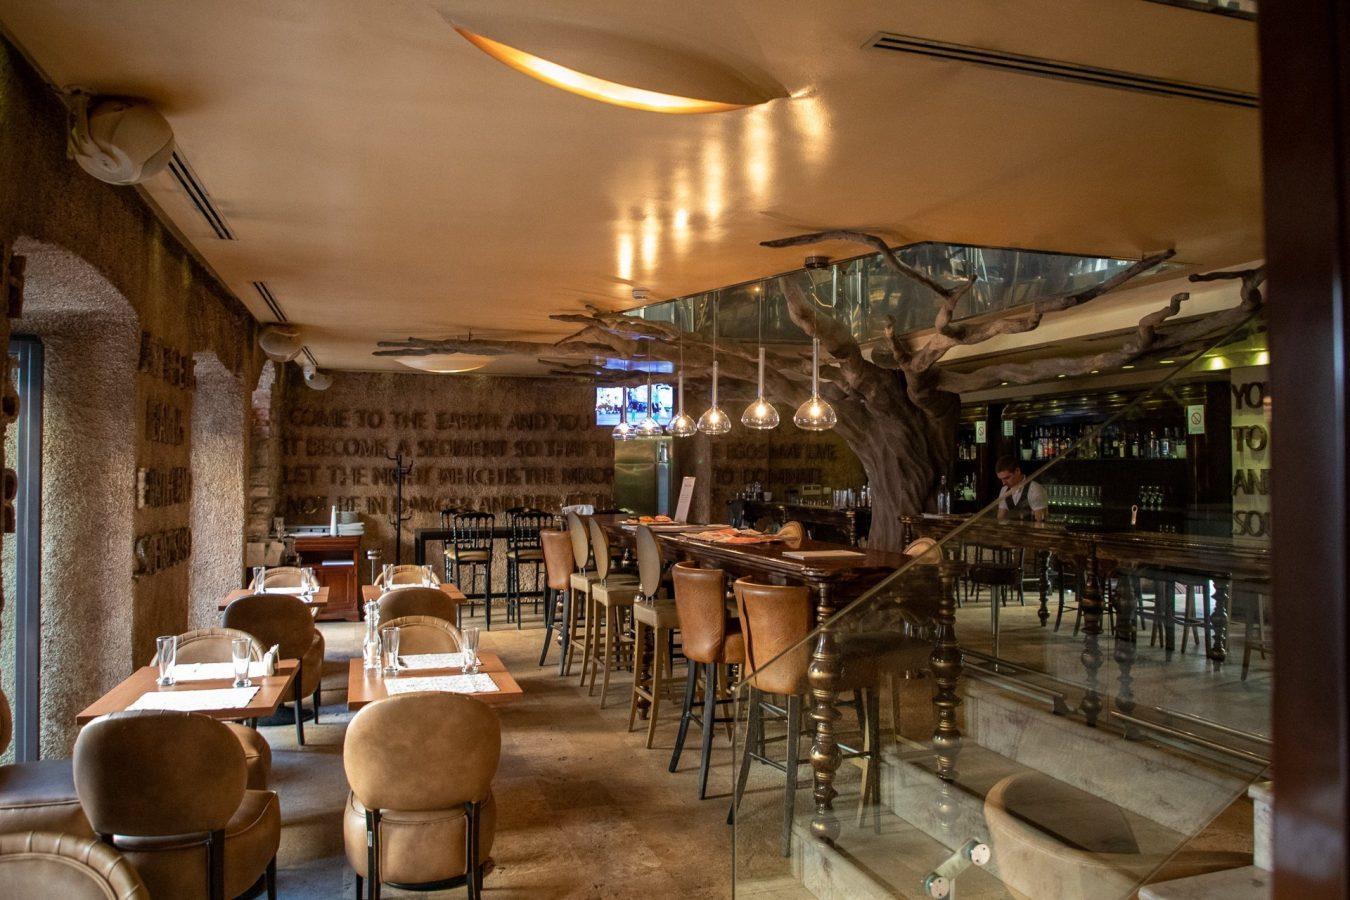 A newer hotel restaurant  in Kotor